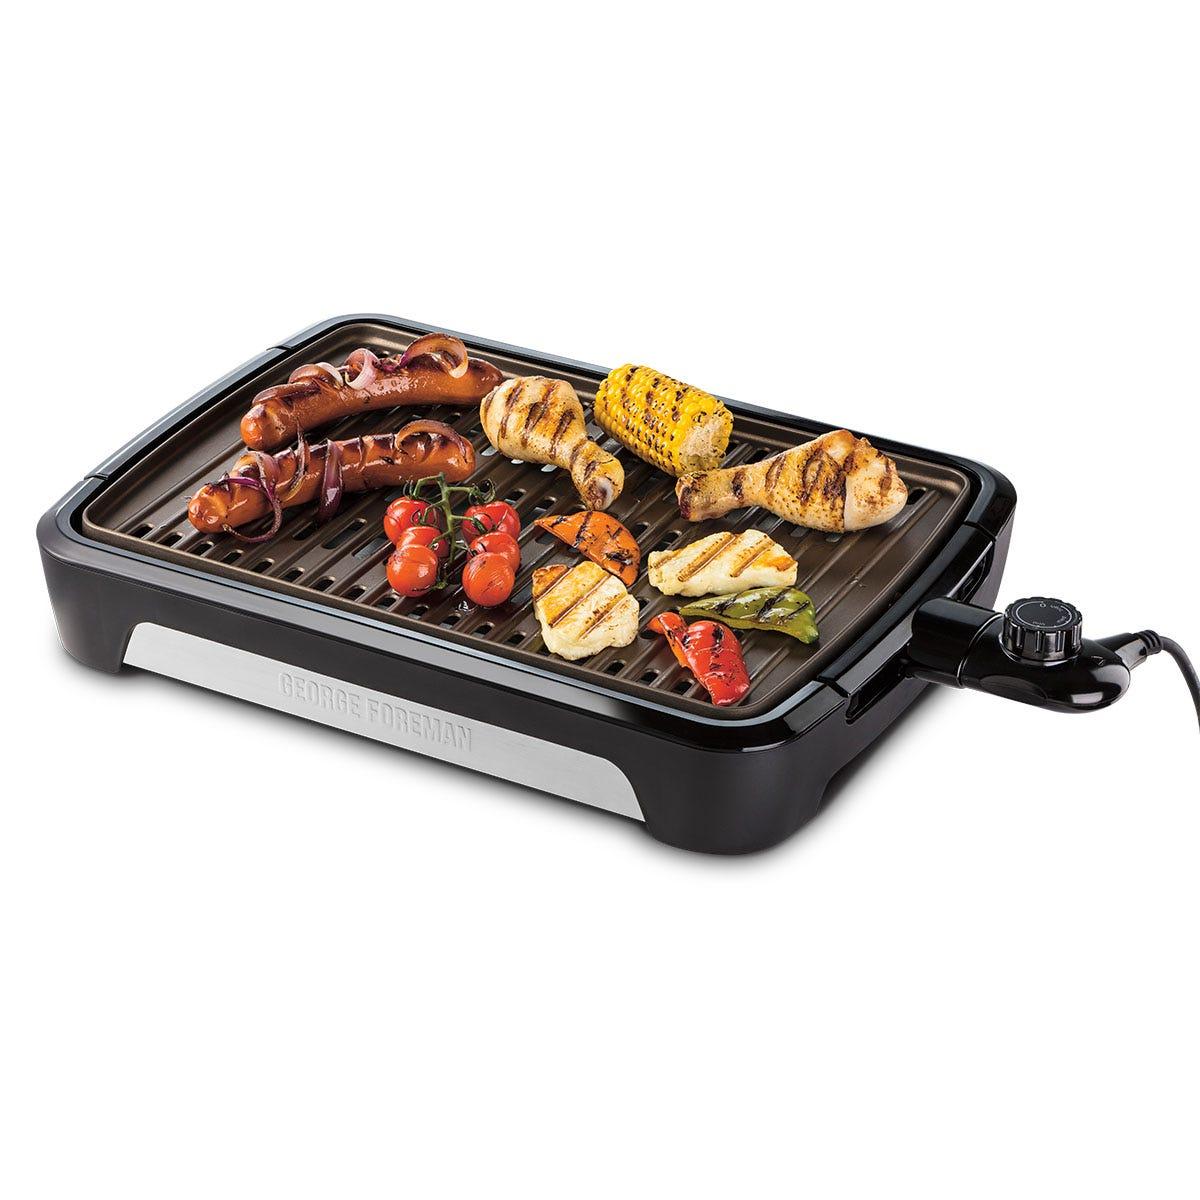 George Foreman 25850 Smokeless Electric 1606W BBQ Grill - Black